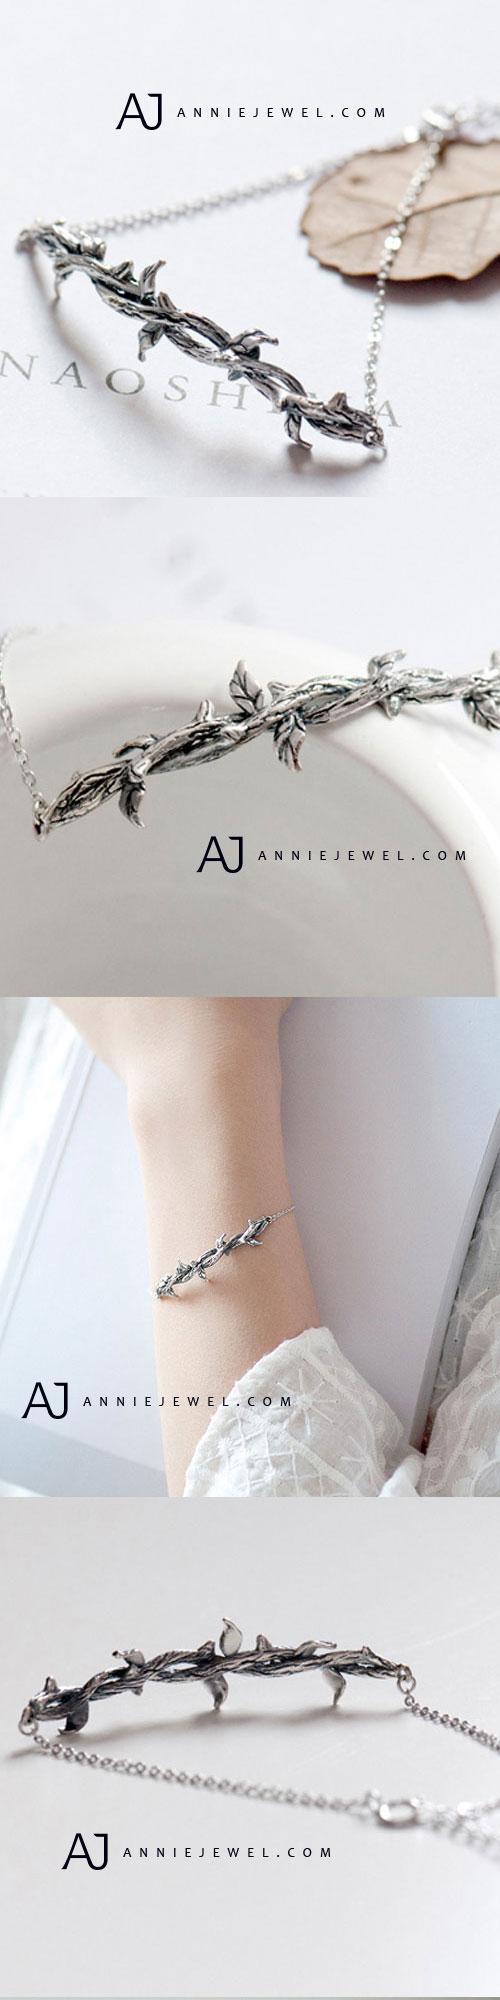 34600084c708e Silver Bracelet Bramble Charm Bracelet Chain Bracelets Gift Jewelry  Accessories Girls Women